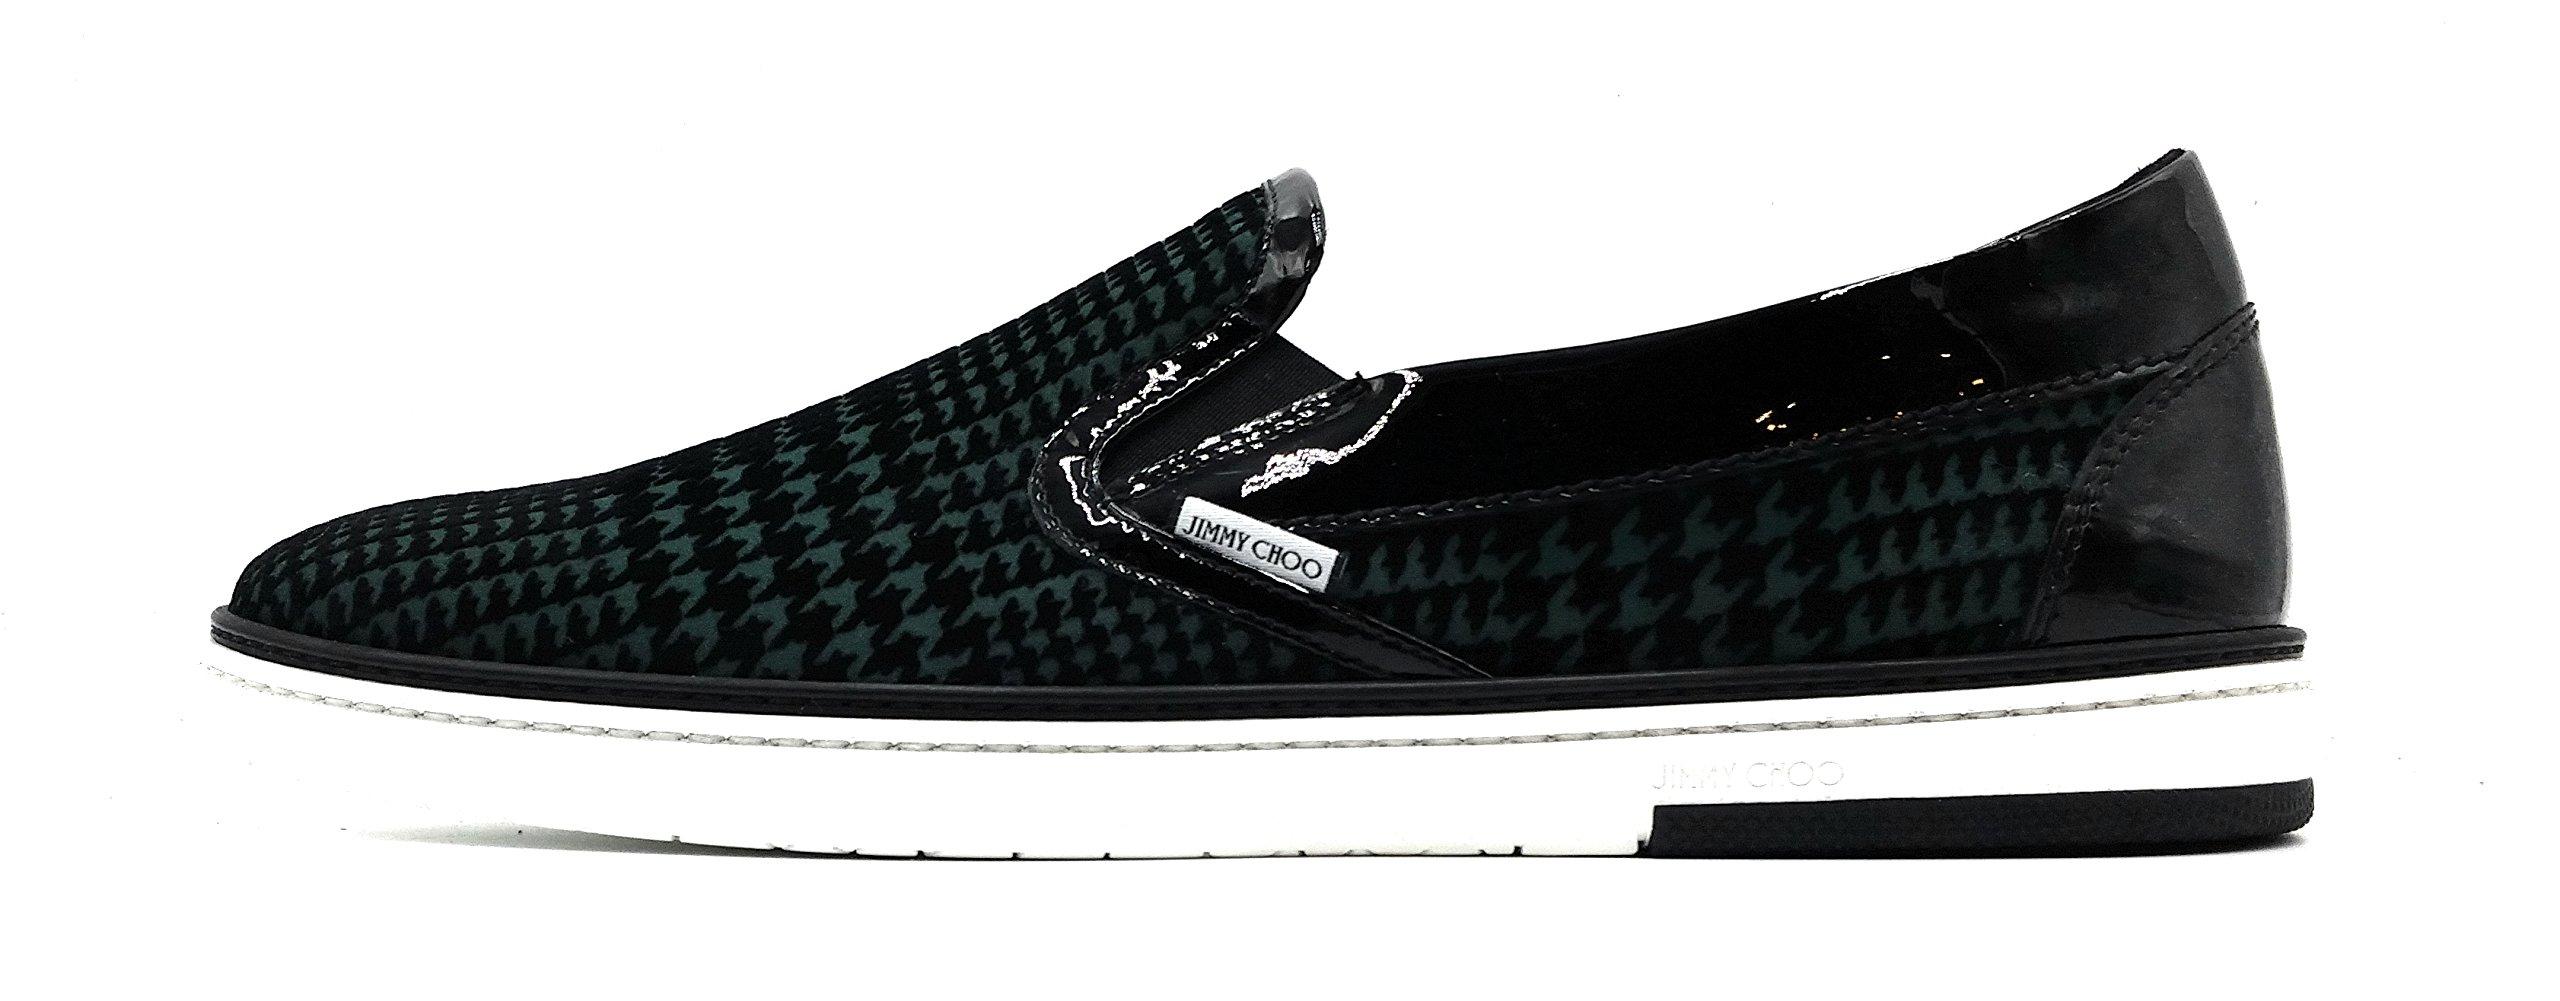 JIMMY CHOO London Flock Houndstooth Skate Sneaker / Loafer (Size 11.5 US / 44.5 EU)